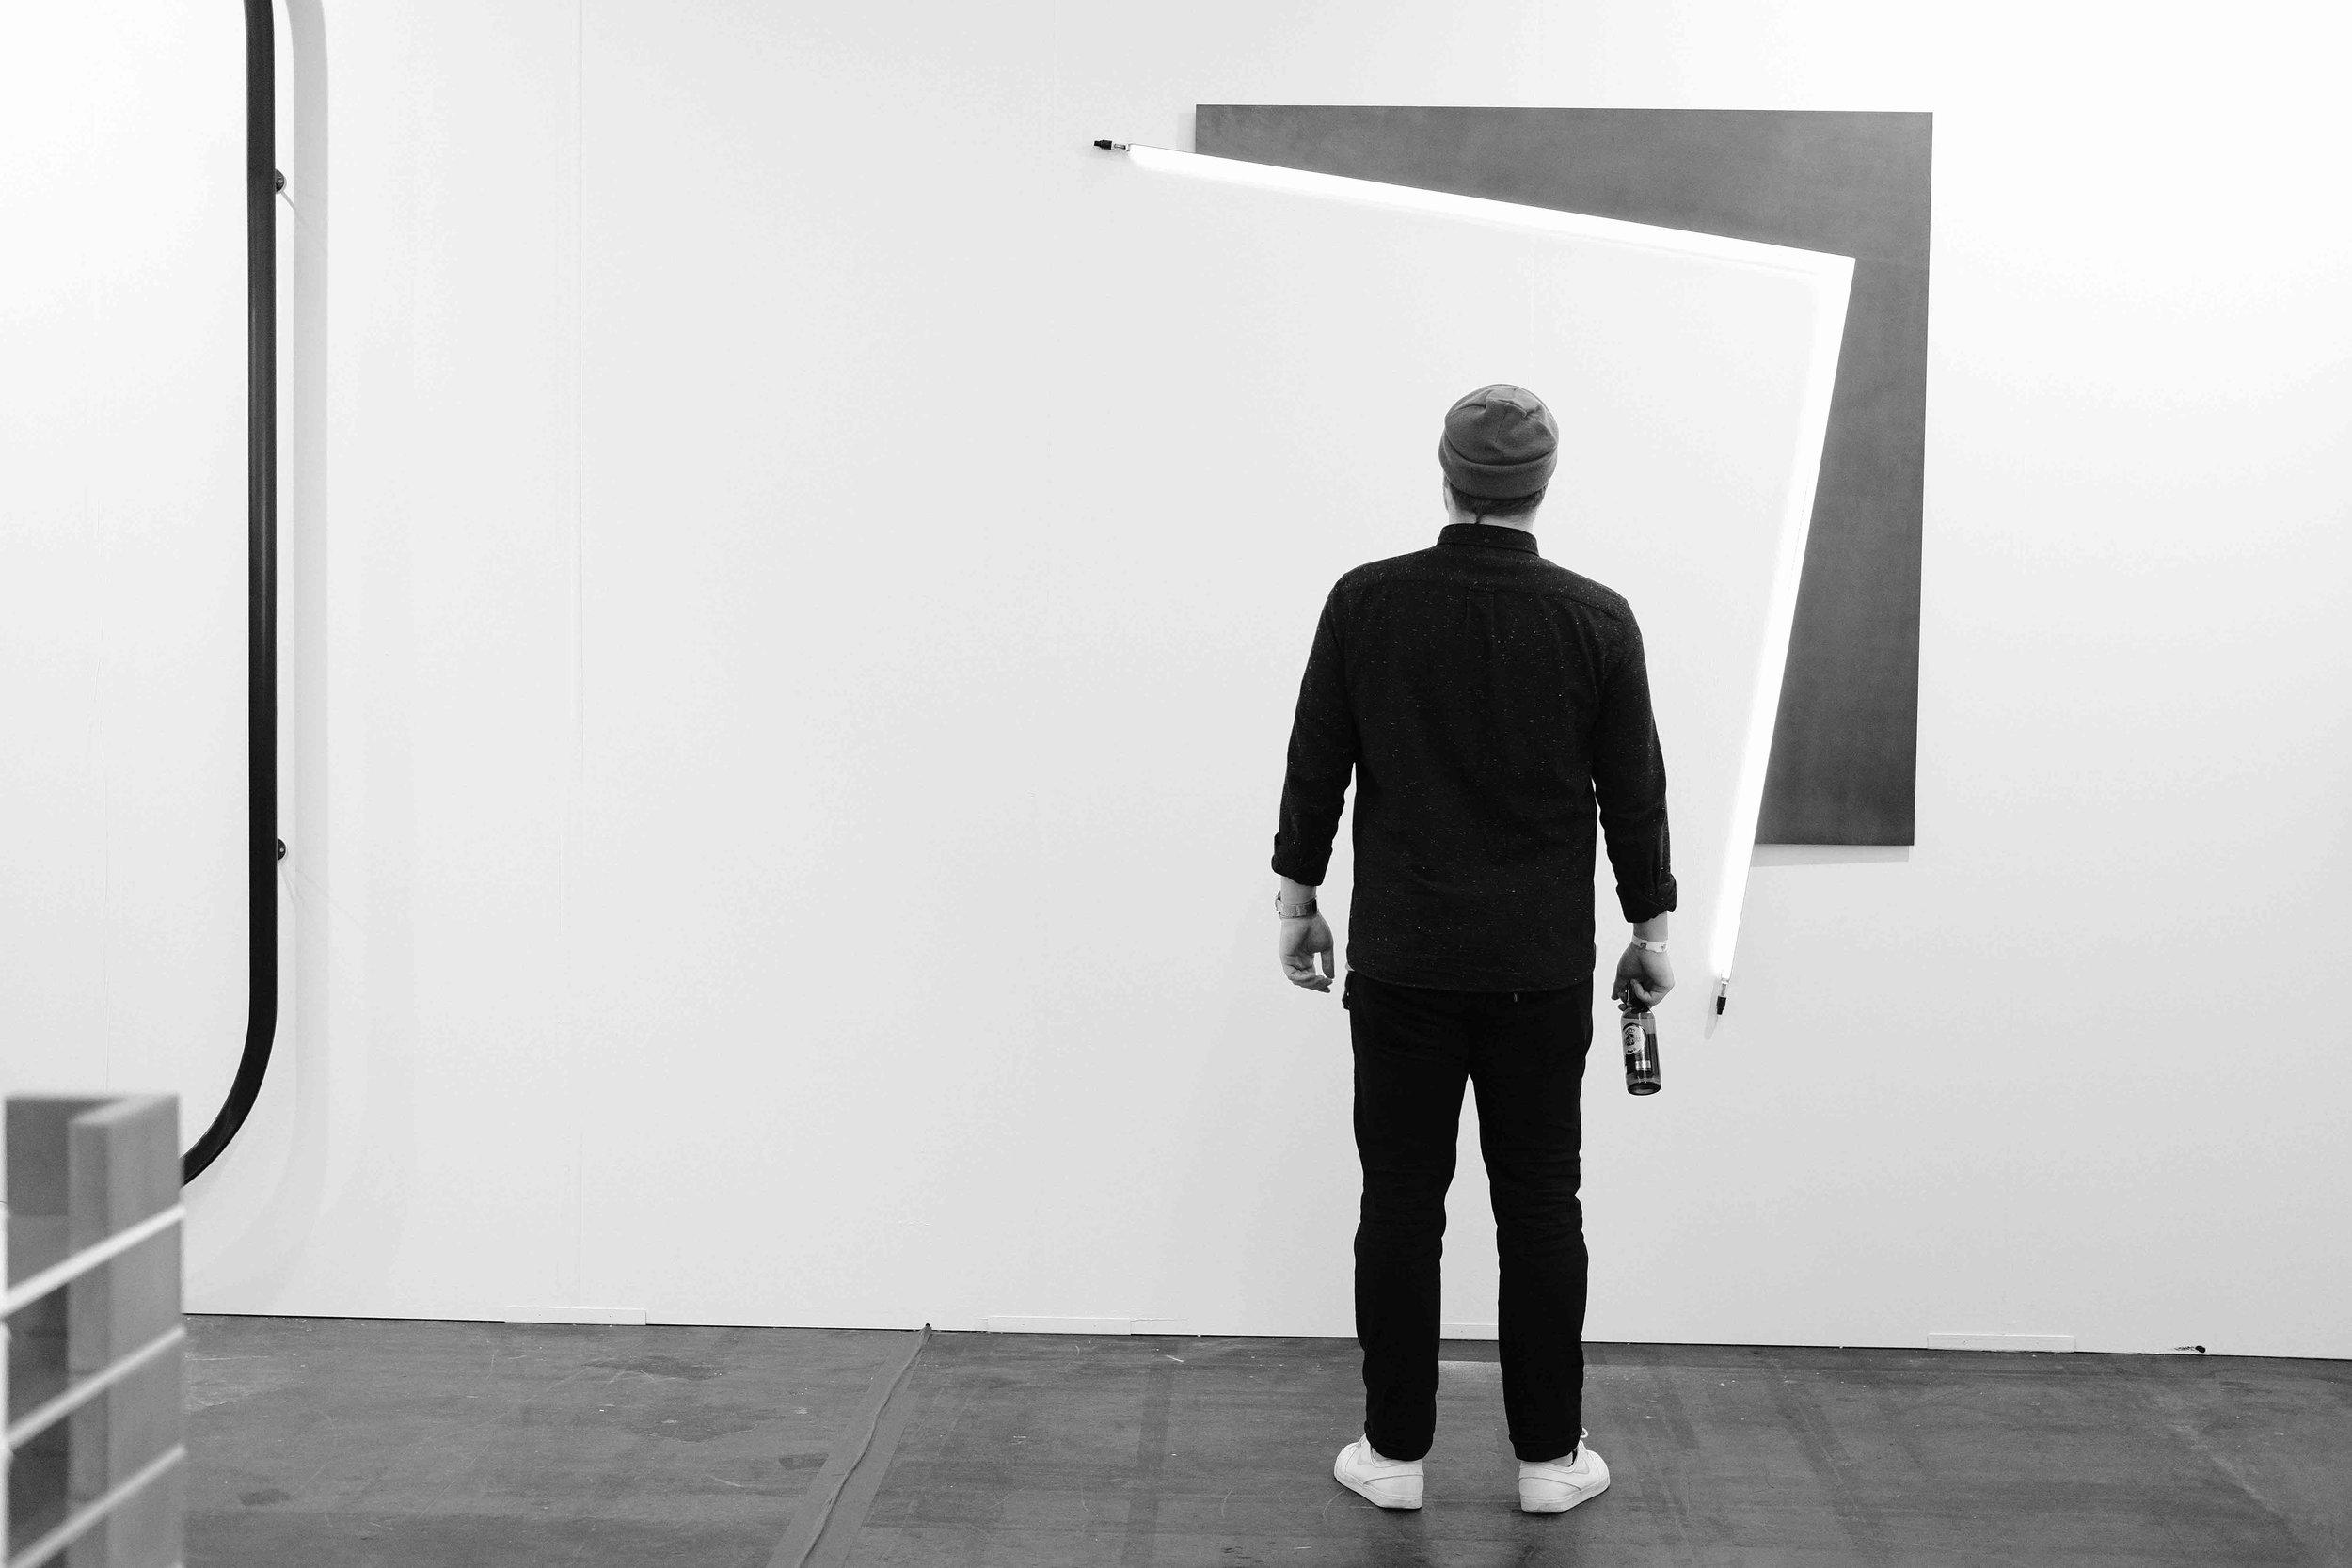 artfair-wearecity-2016-simonhariman-atheneadiapoulis-179.jpg